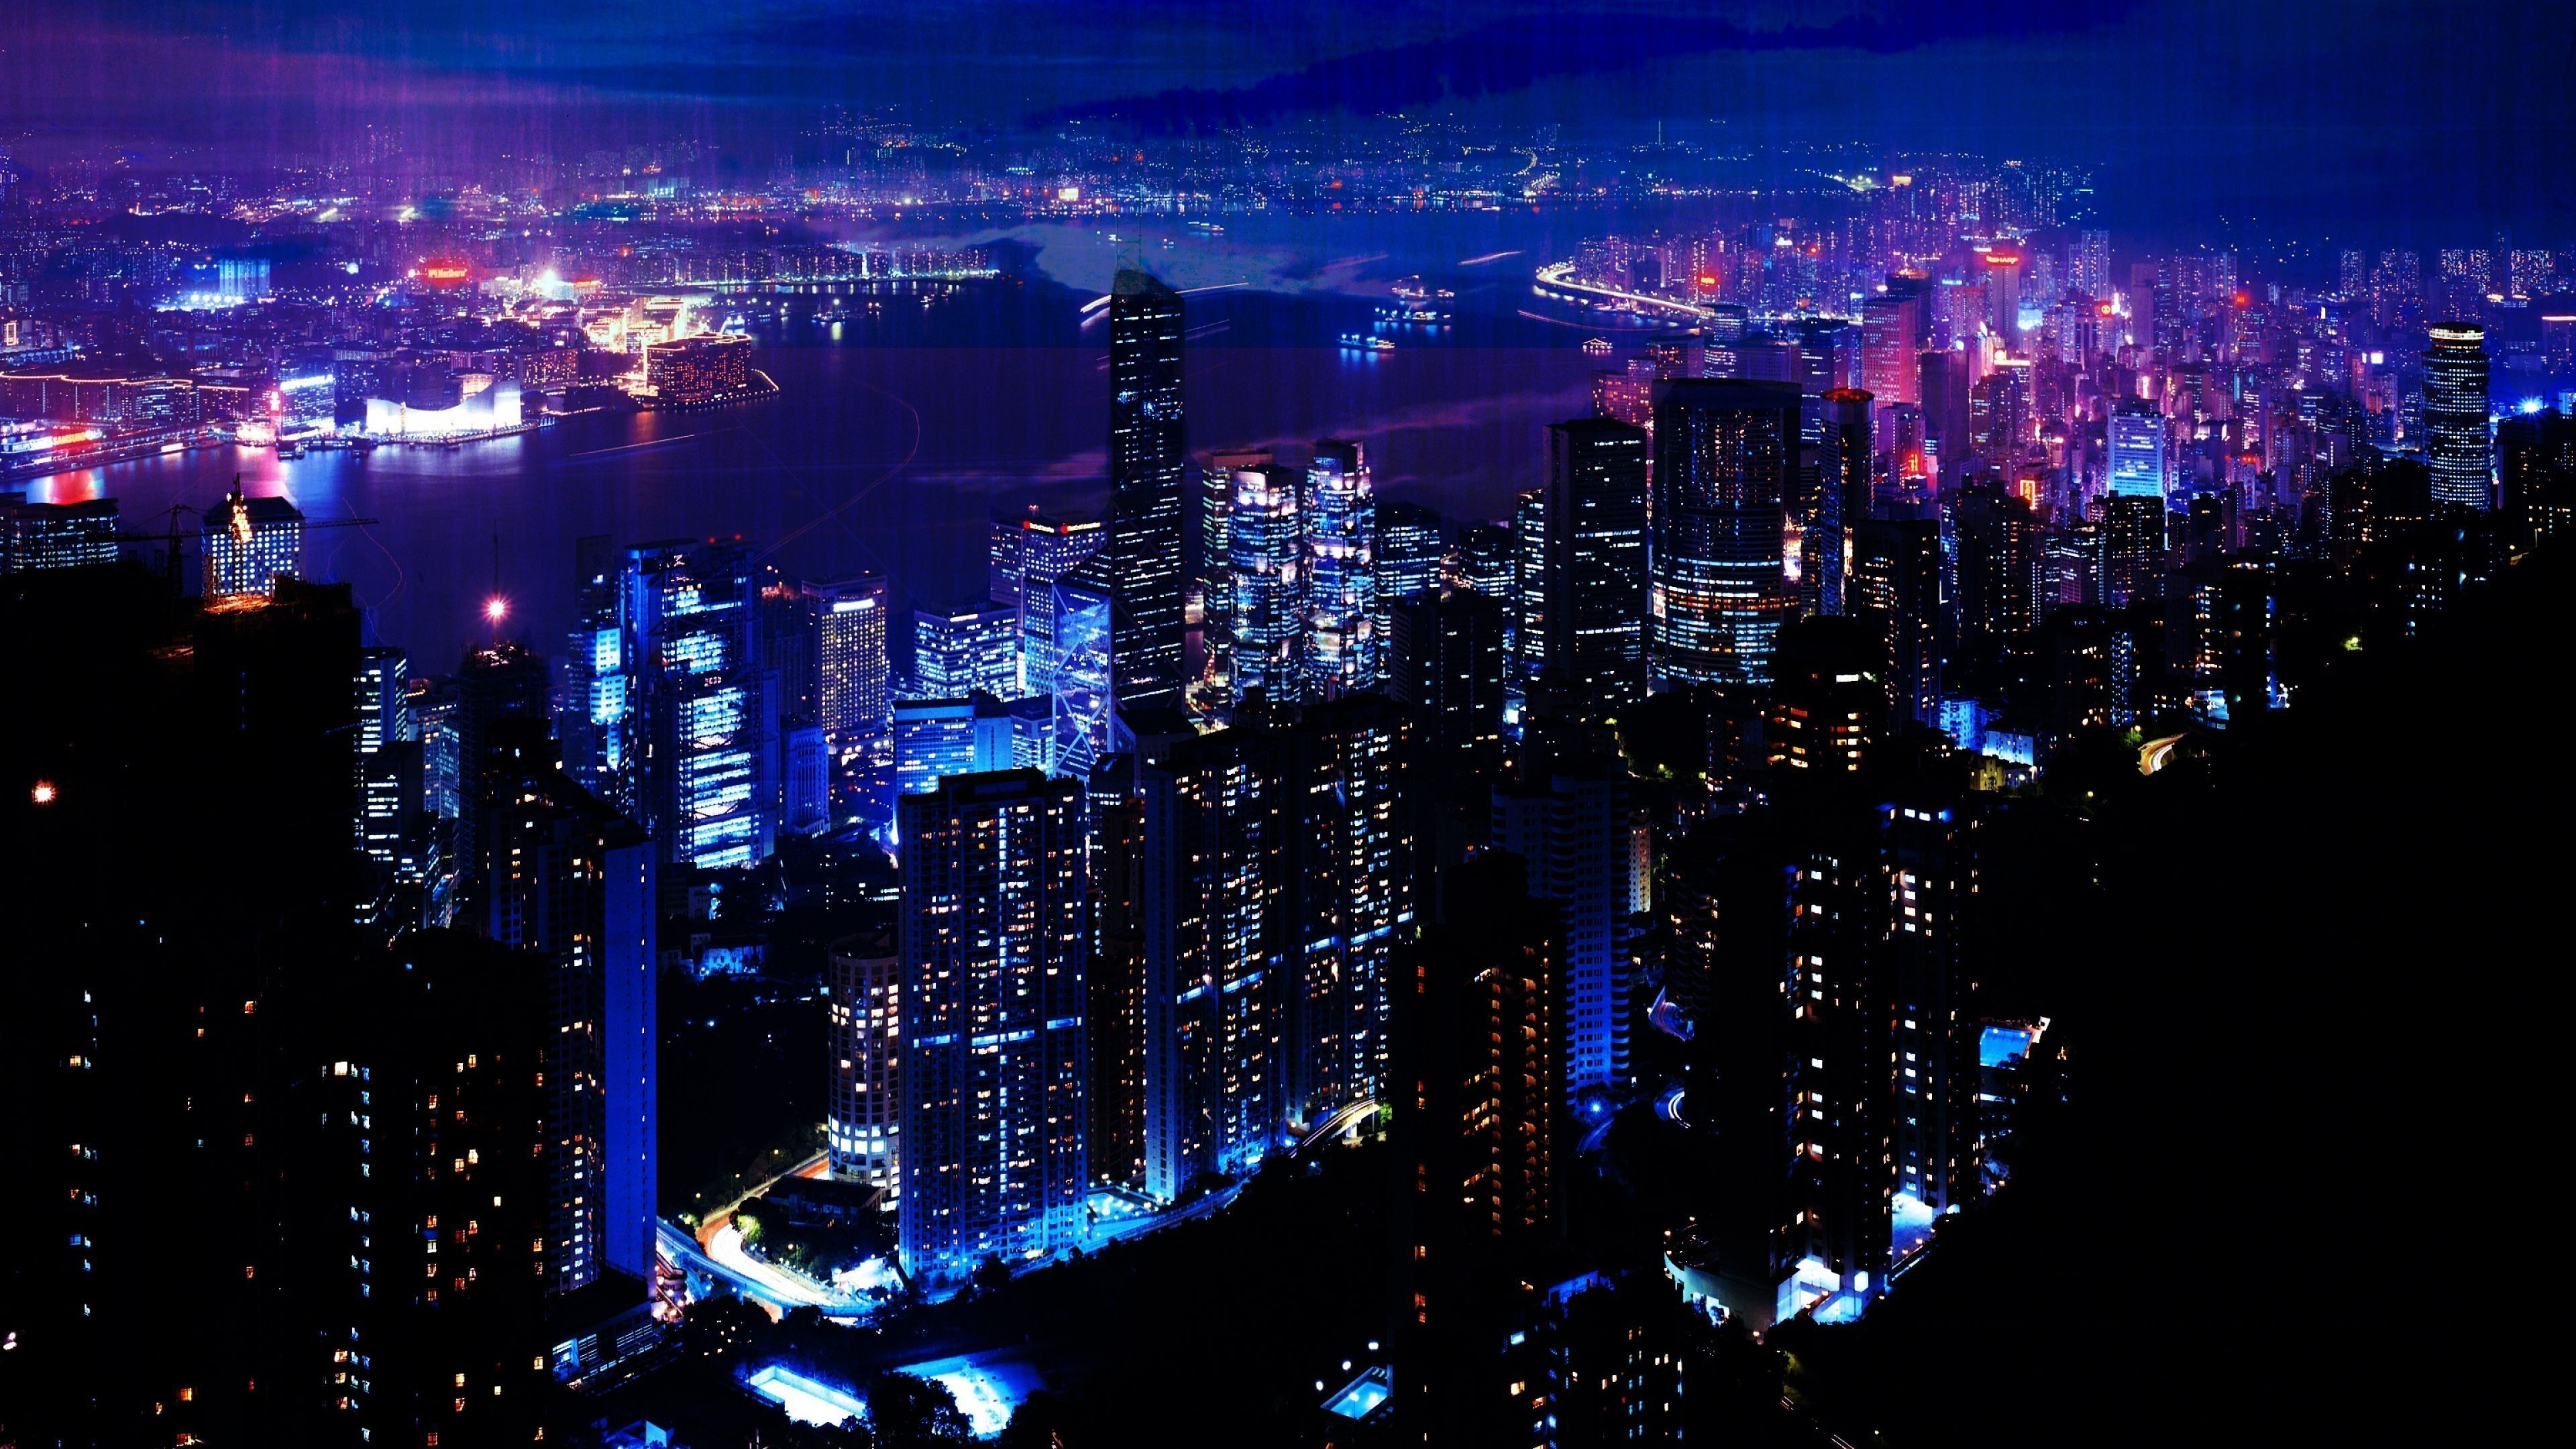 3840x2160 Download Wallpaper 3840x2160 Night City Sky